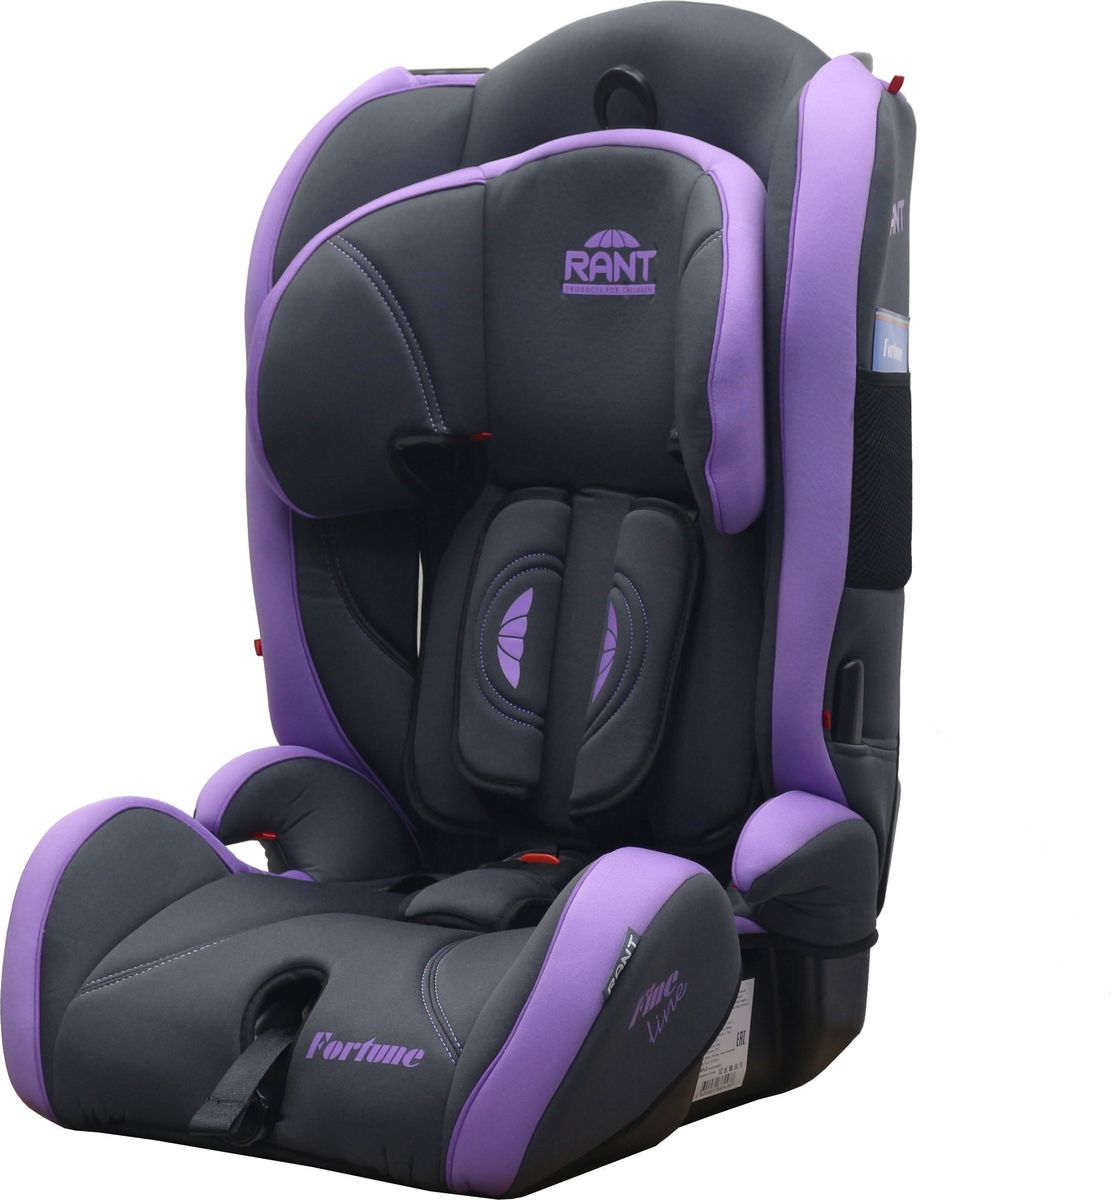 Rant Автокресло Fortune Fine Line цвет фиолетовый от 9 до 36 кг